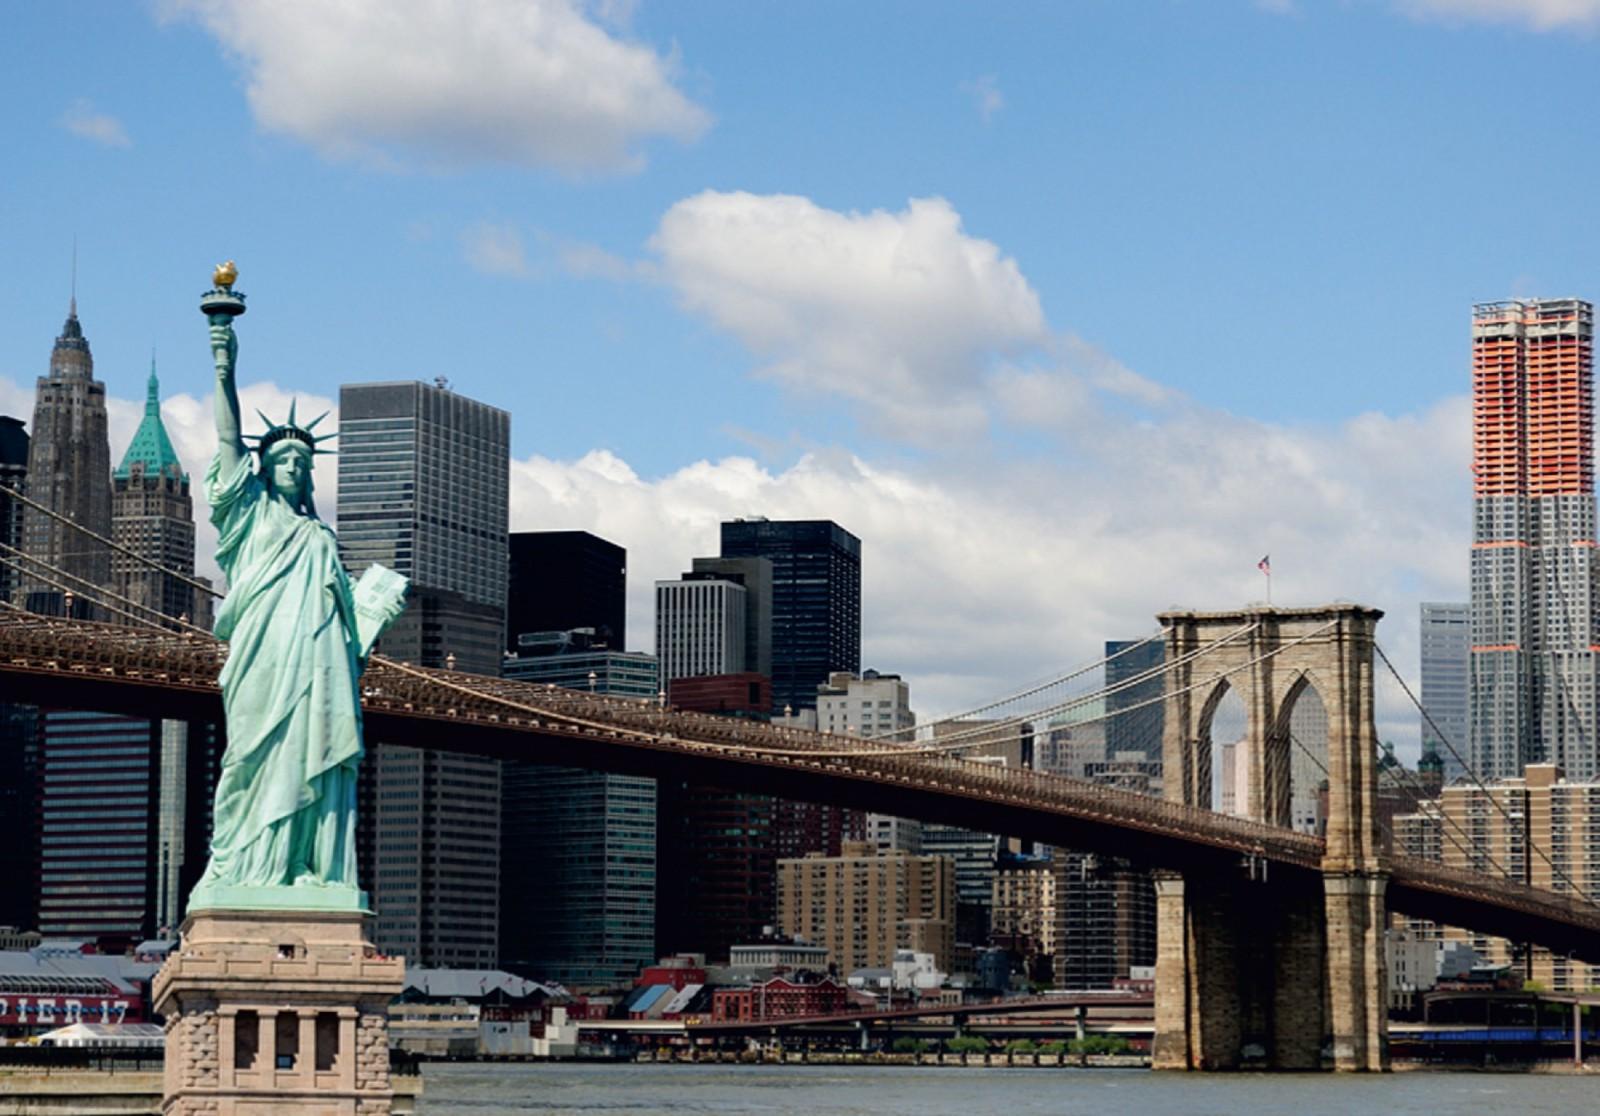 Photo Wallpaper Mural New York Statue Of Liberty City